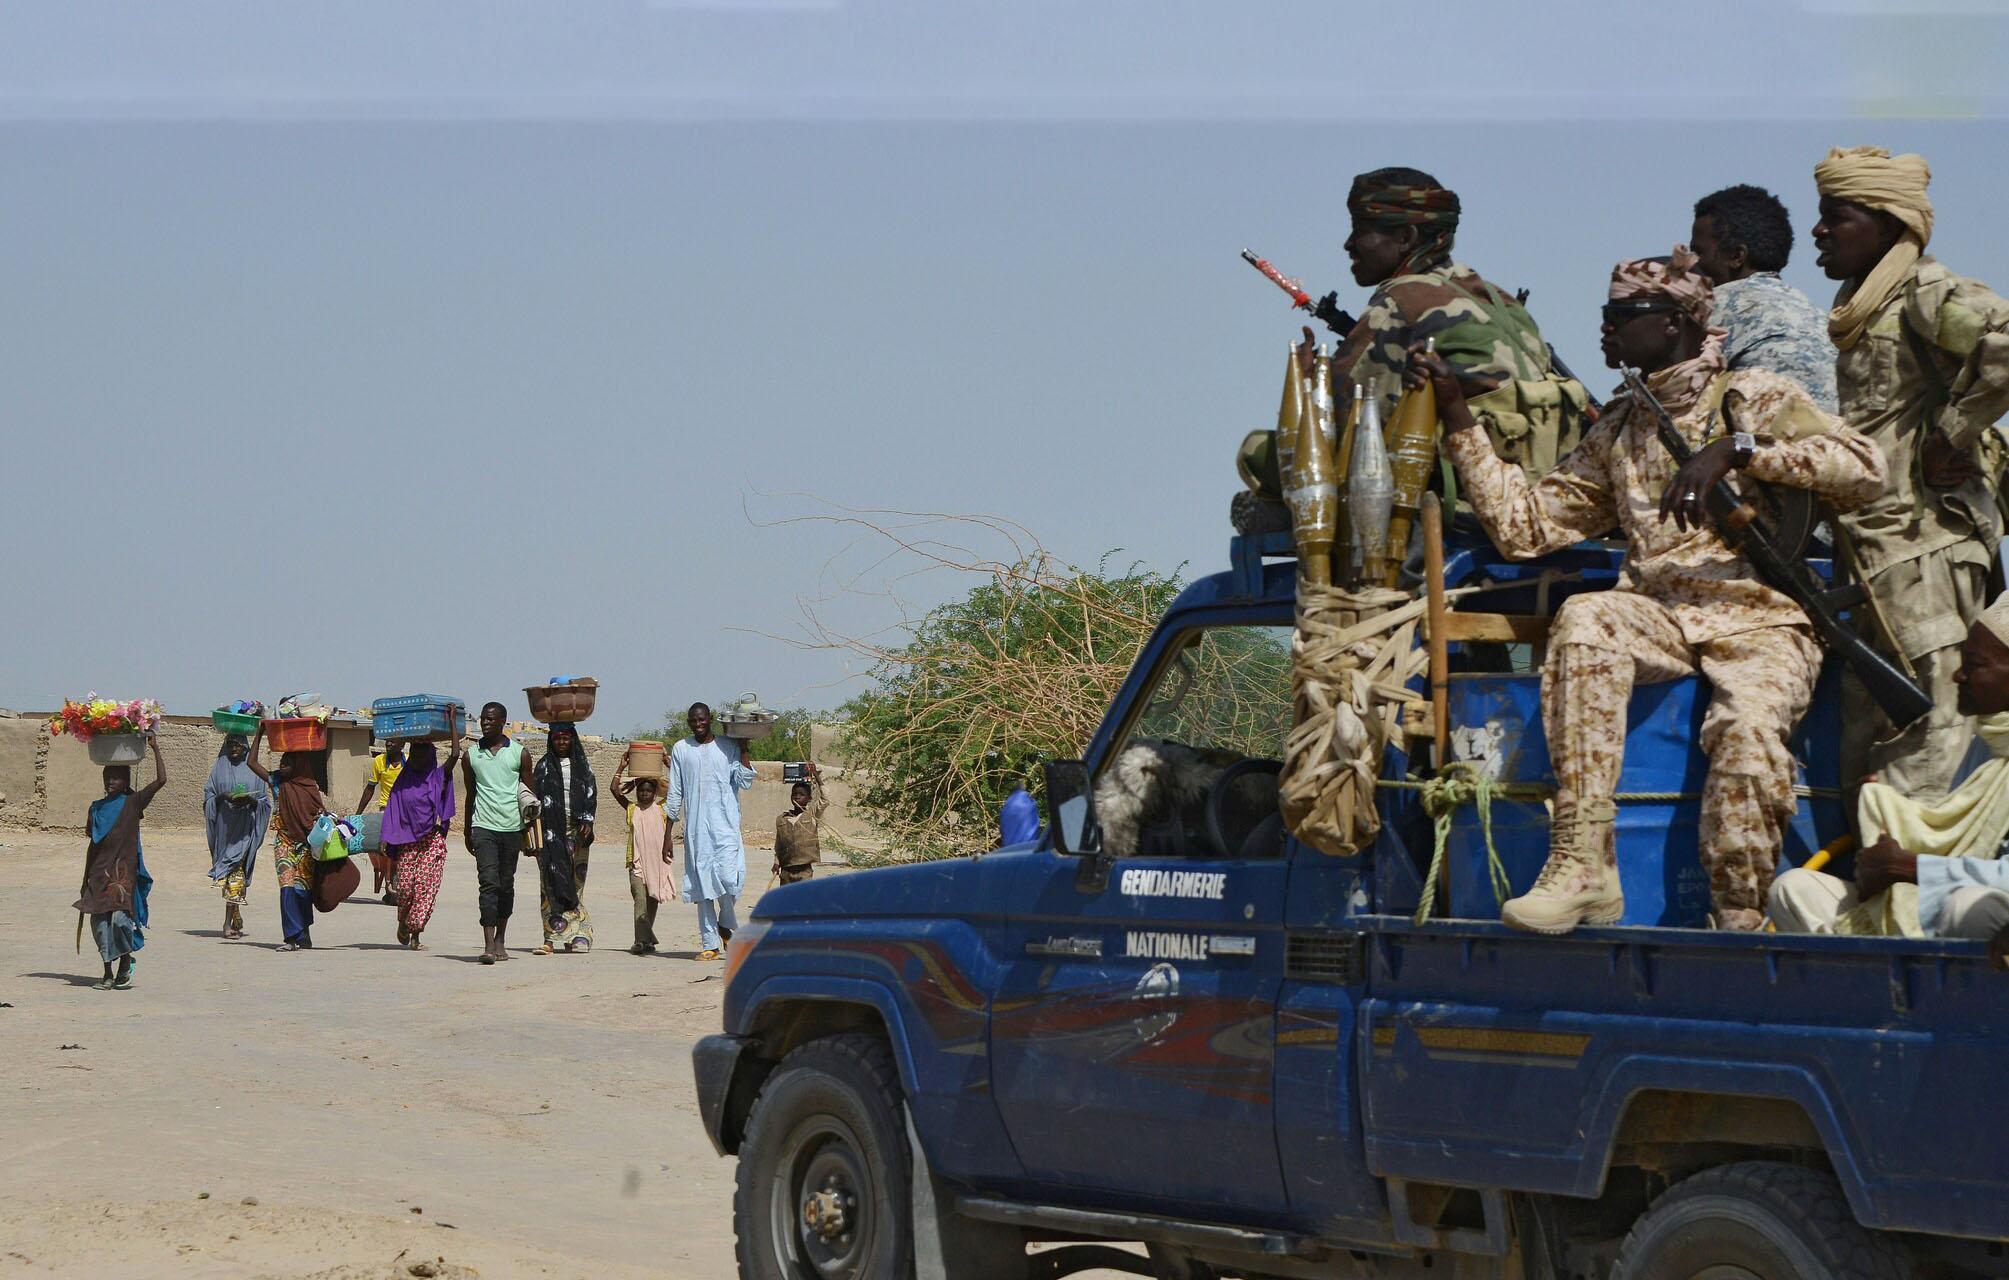 https://www.csis.org/analysis/conduct-key-improving-civilian-protection-nigeria